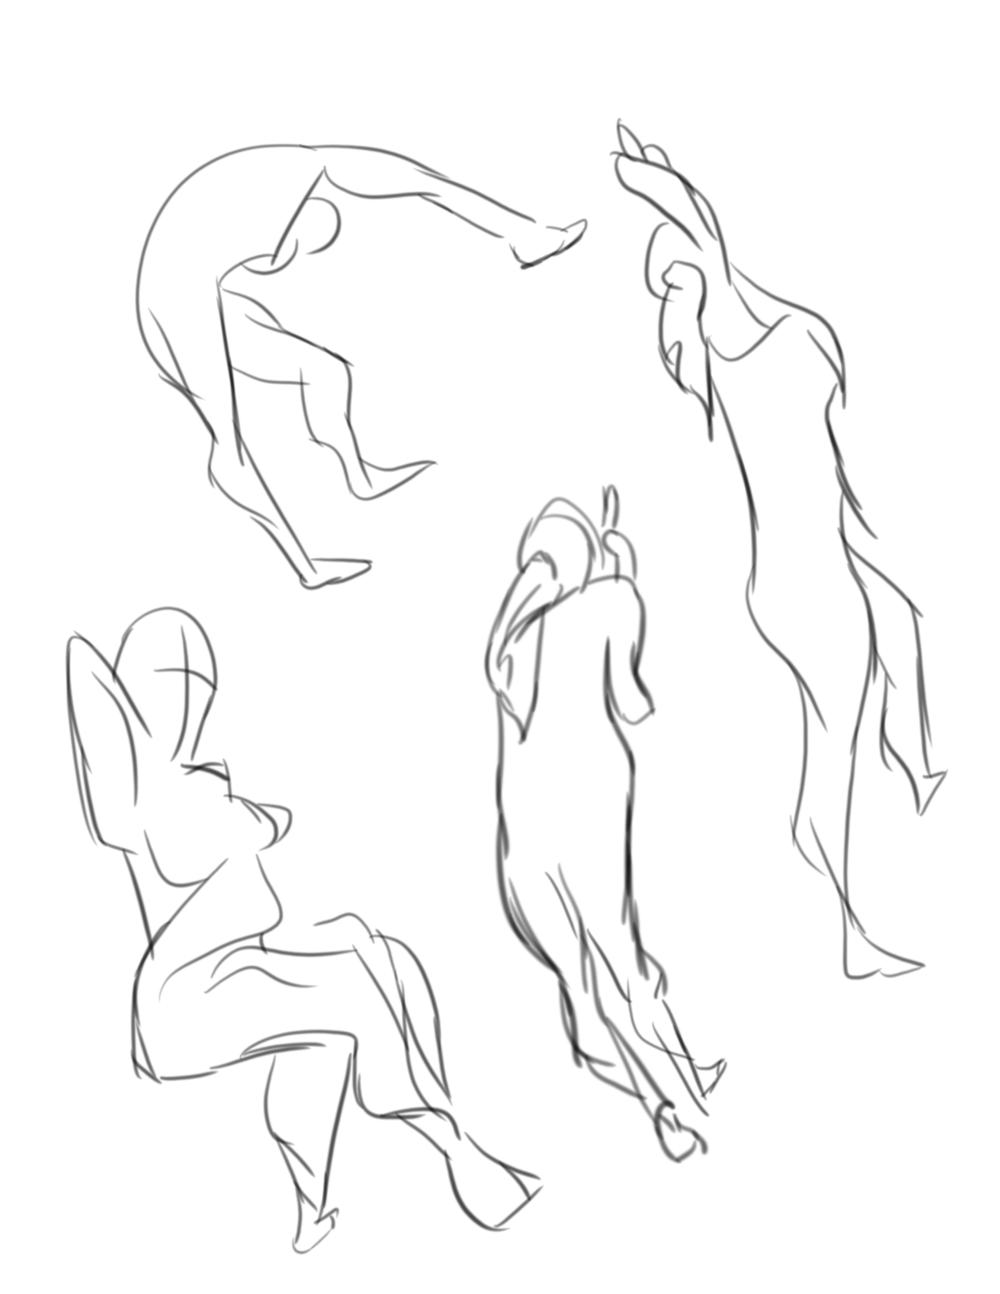 Life Drawings2.png